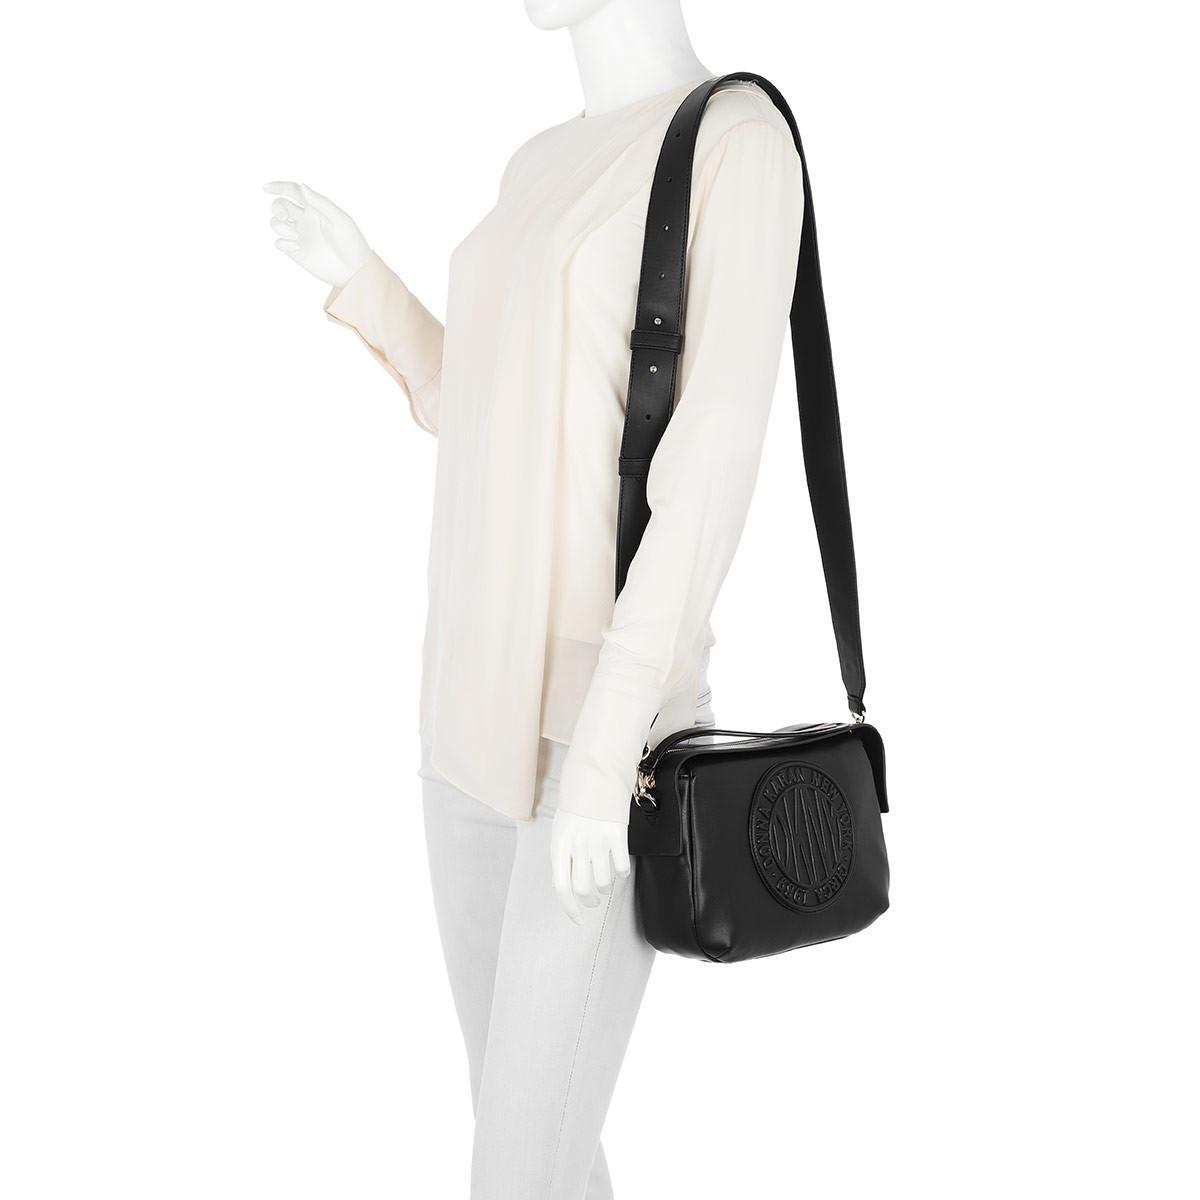 DKNY Leather Tilly Circa Crossbody Bag Black